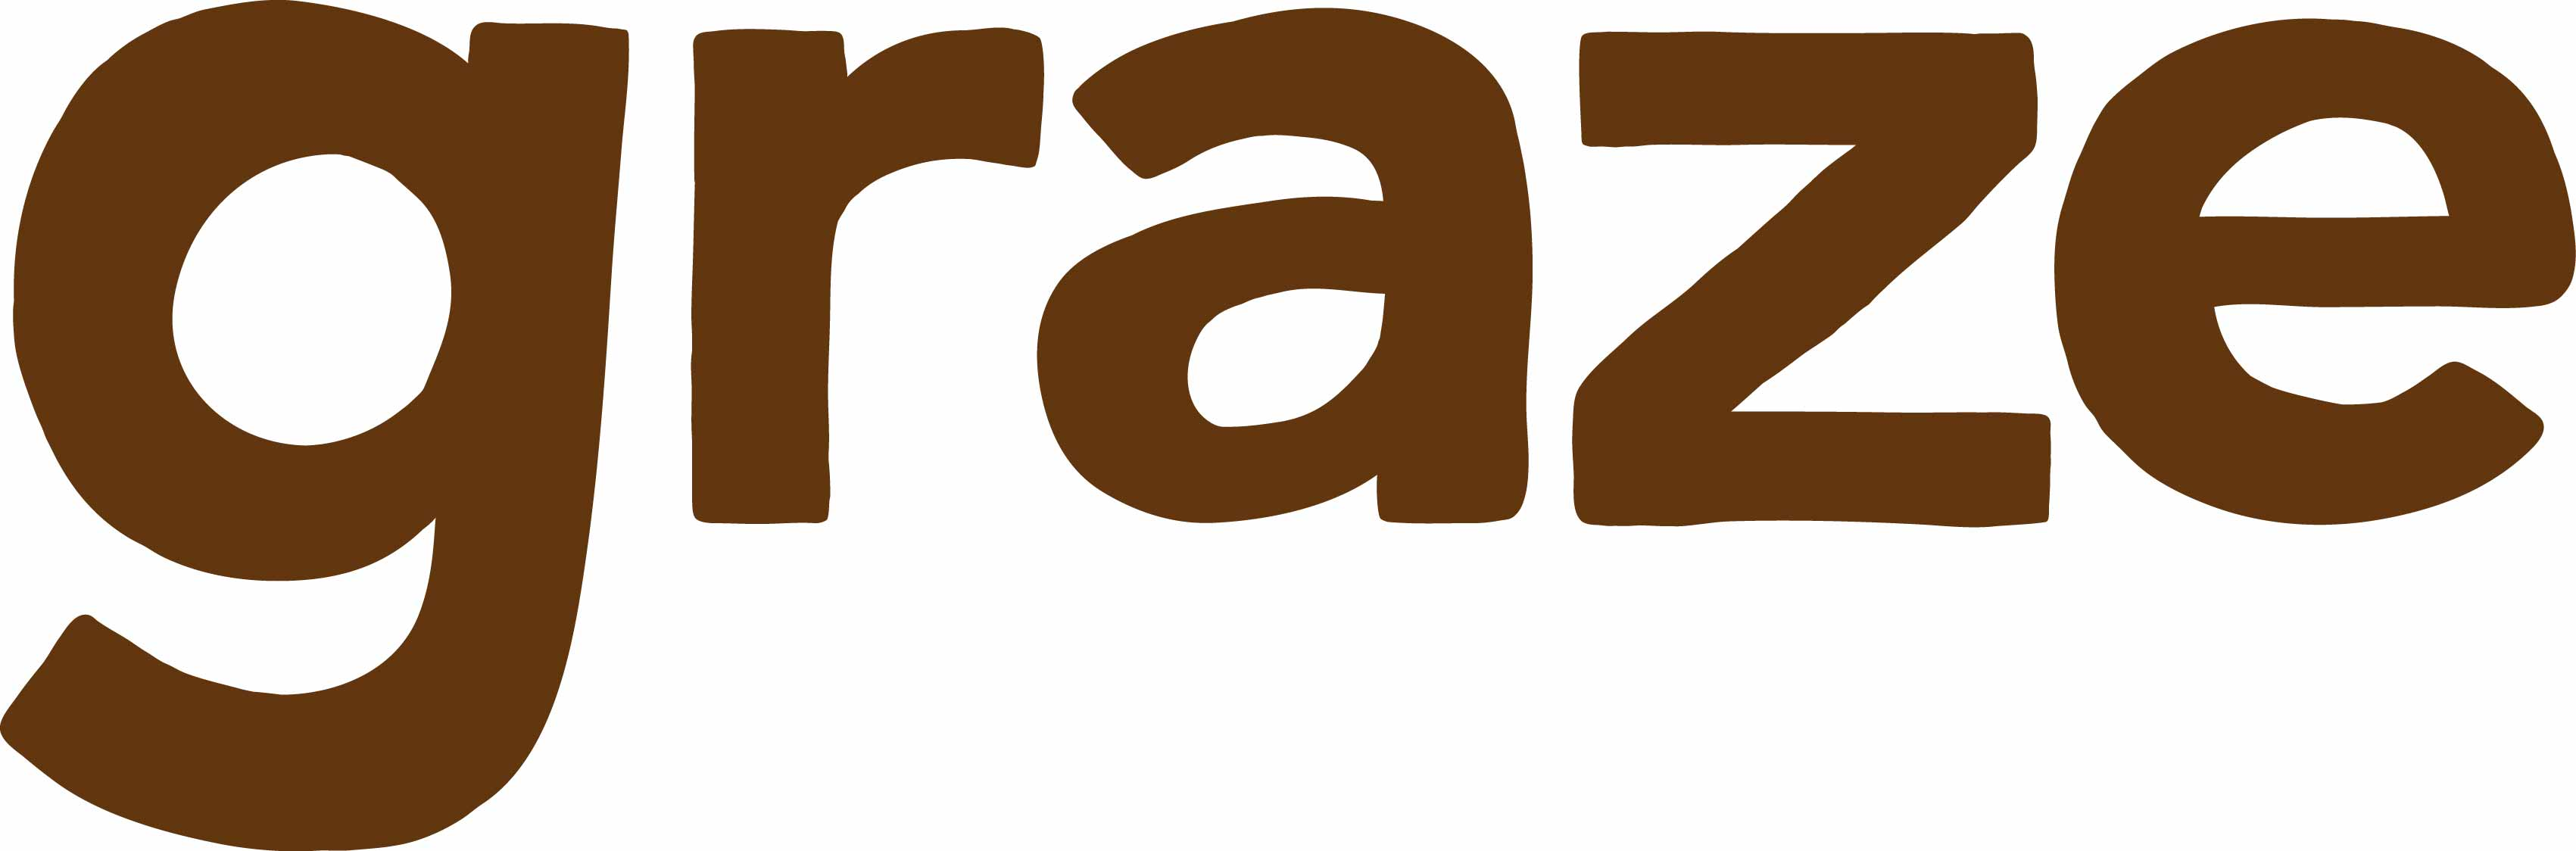 graze snacks, graze podcast, graze snacks style girlfriend, graze snacks logo